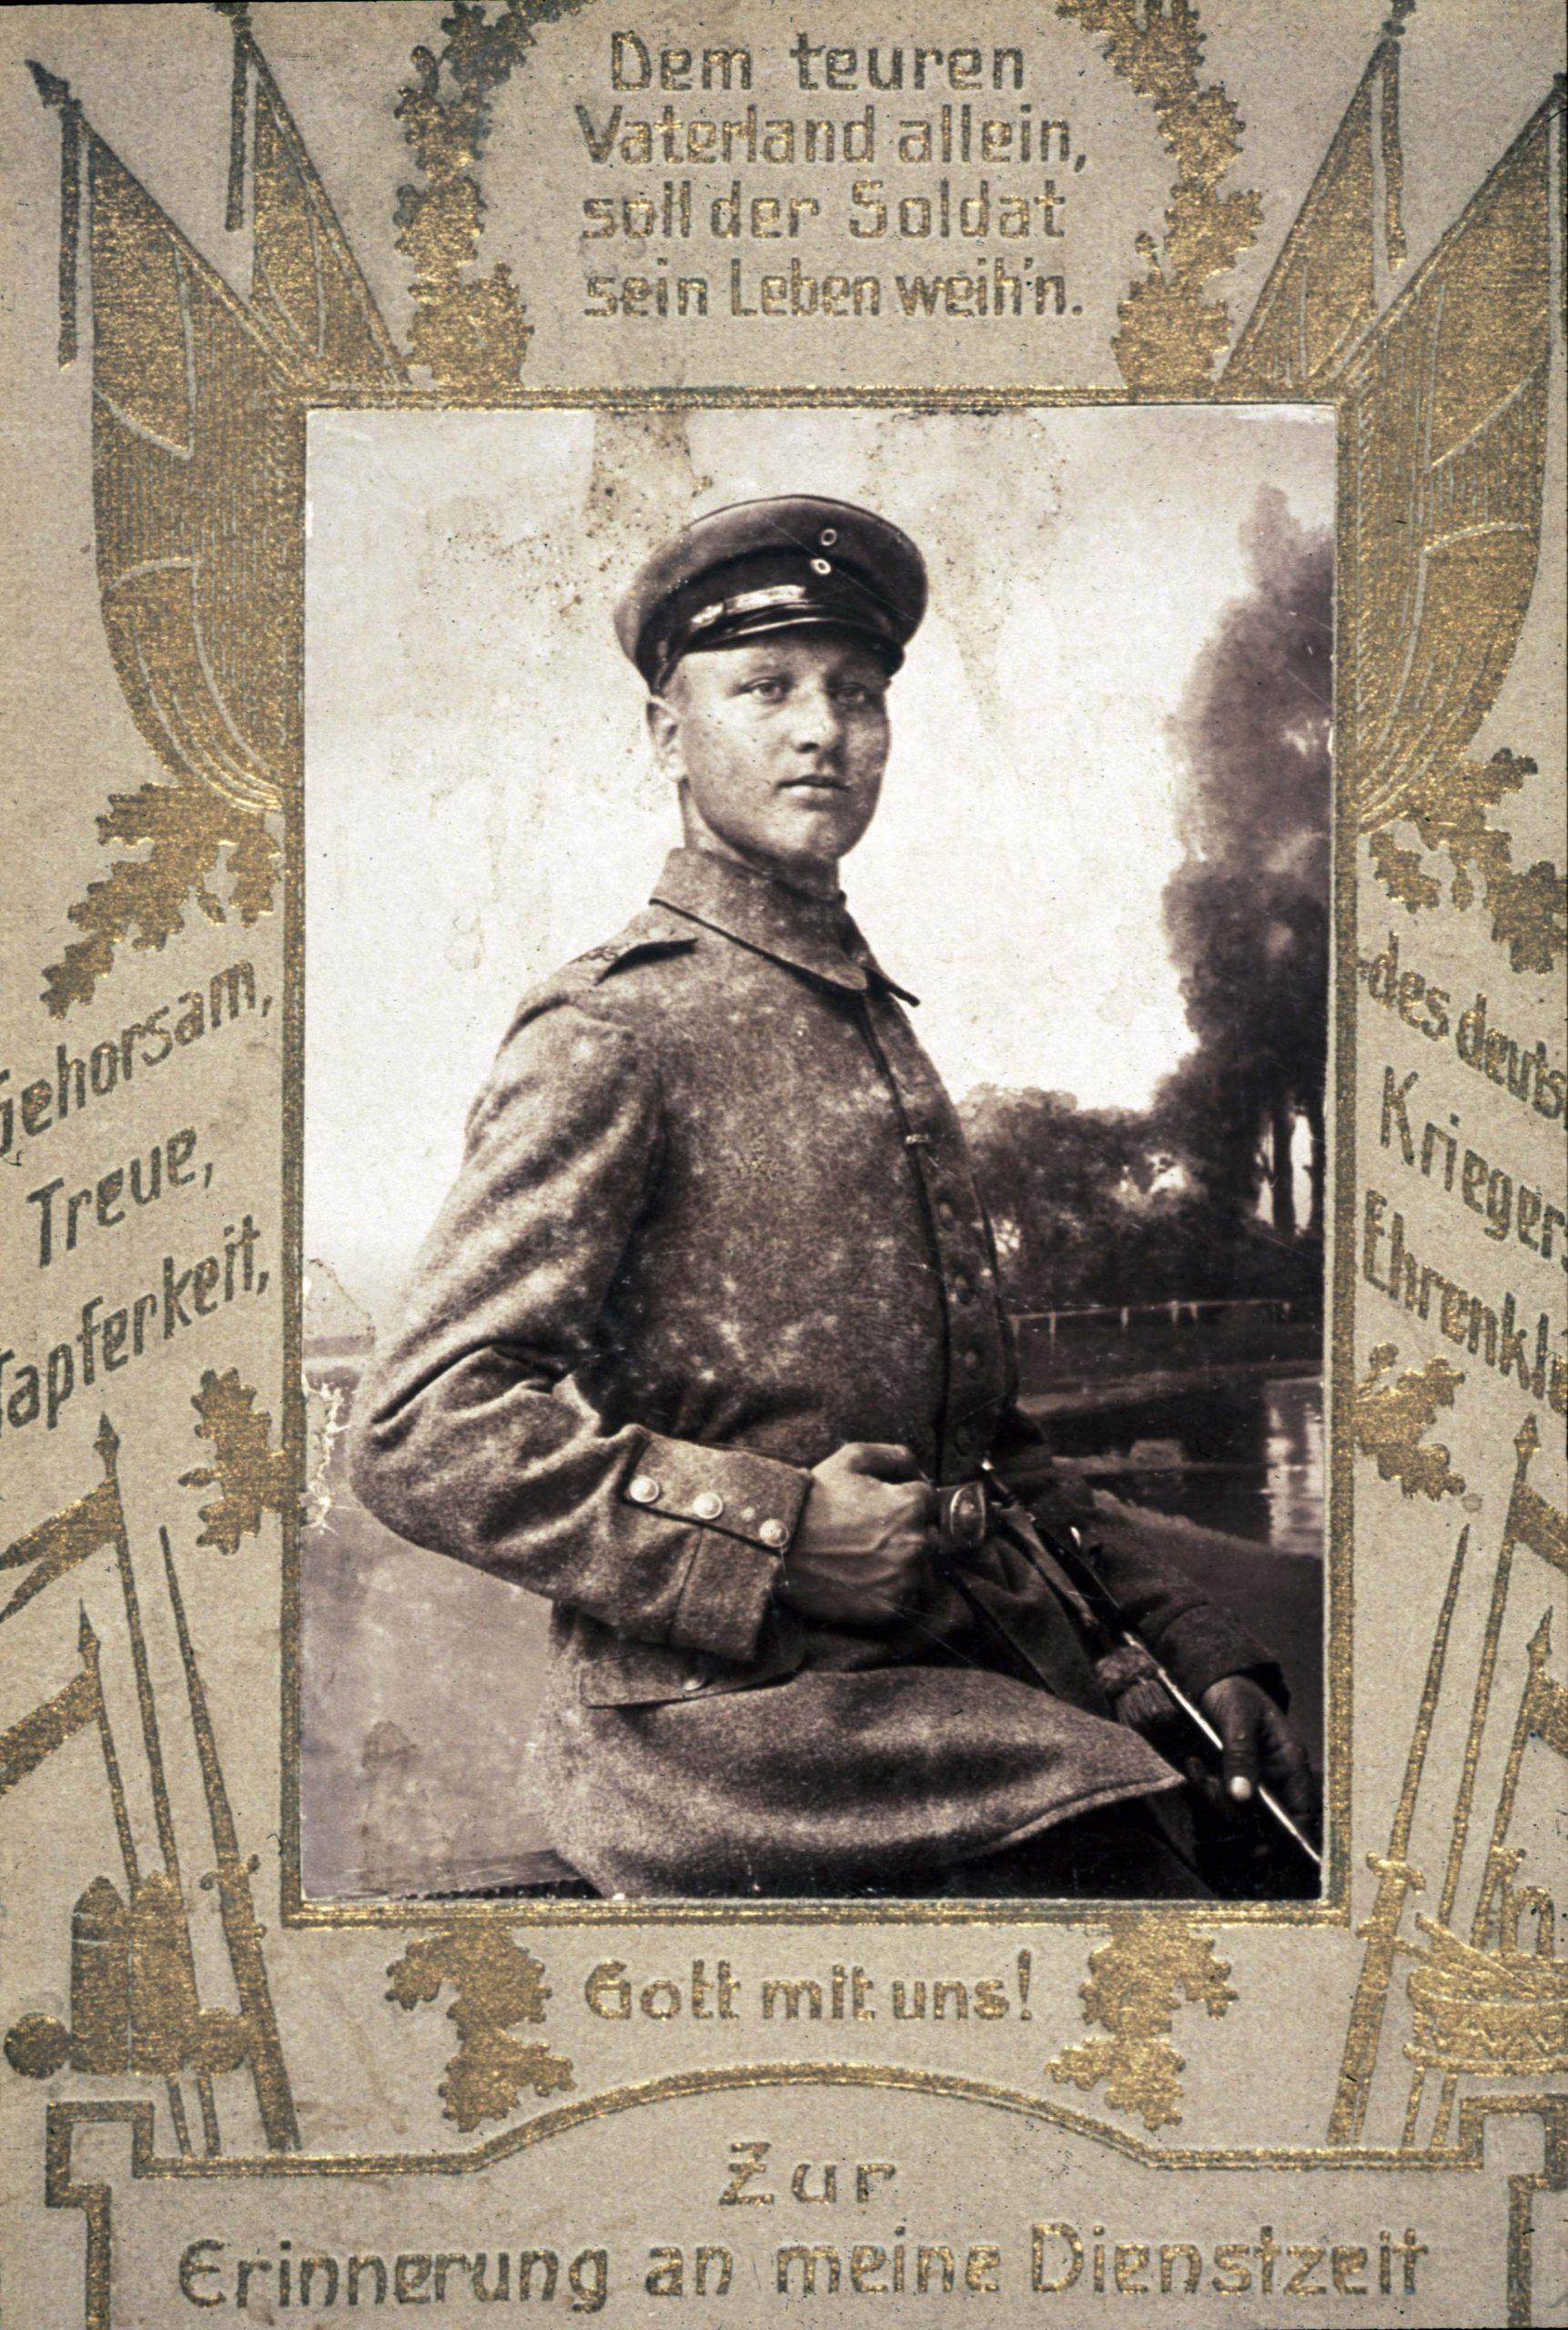 Joh. als Soldat - um 1915